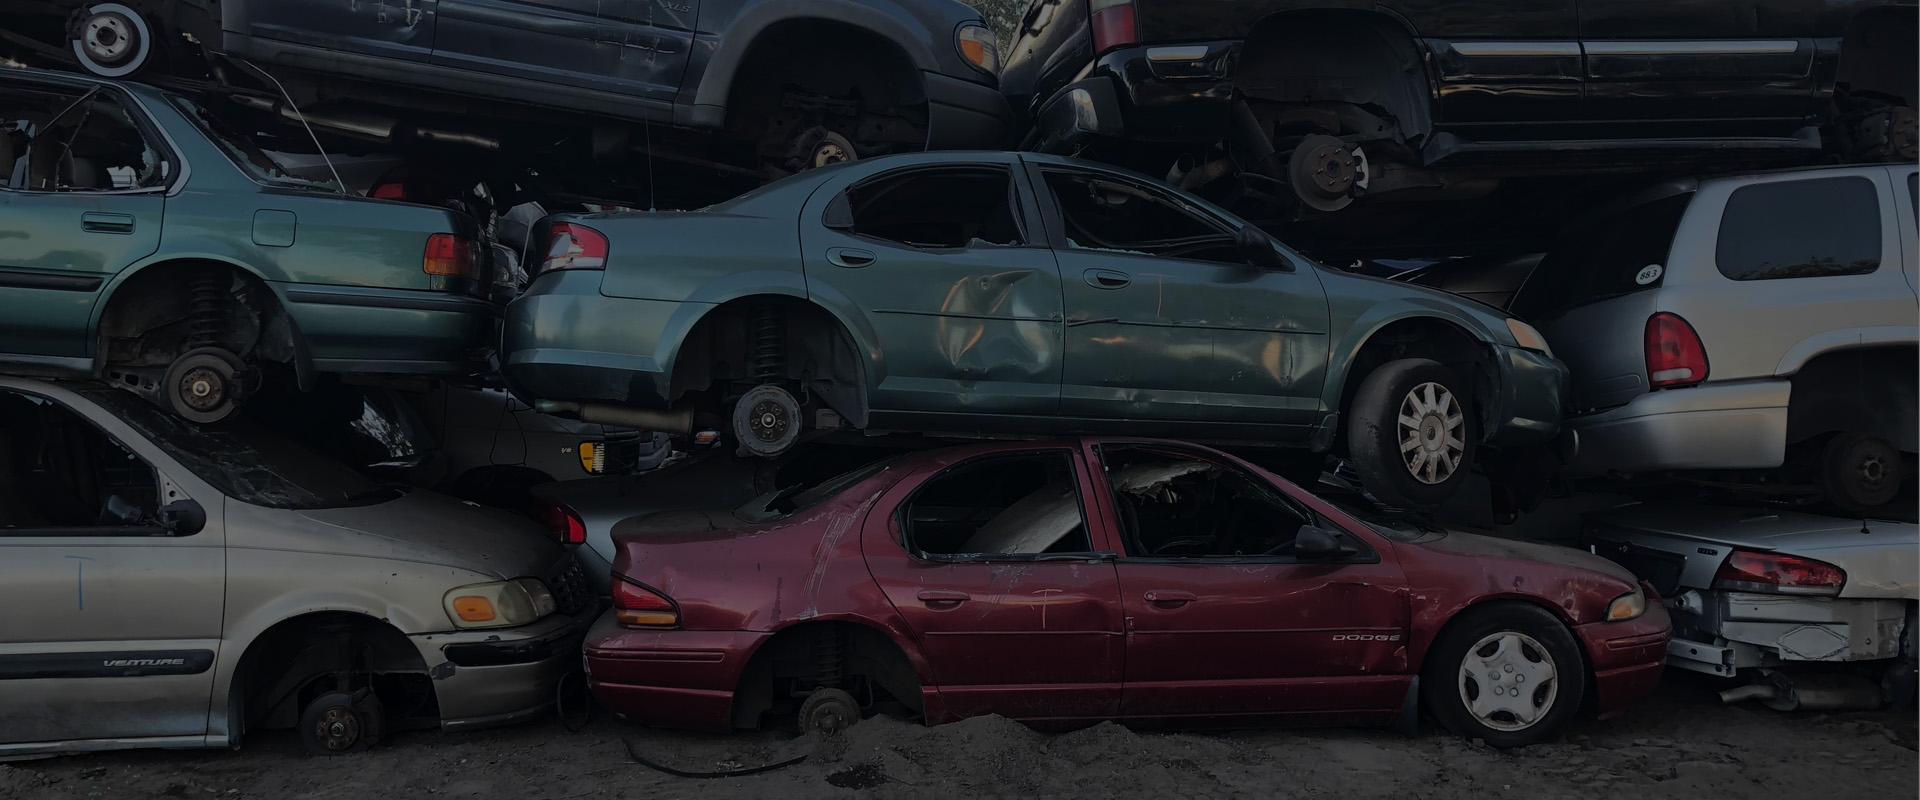 Comfortable Junk Car Yards Images - Classic Cars Ideas - boiq.info